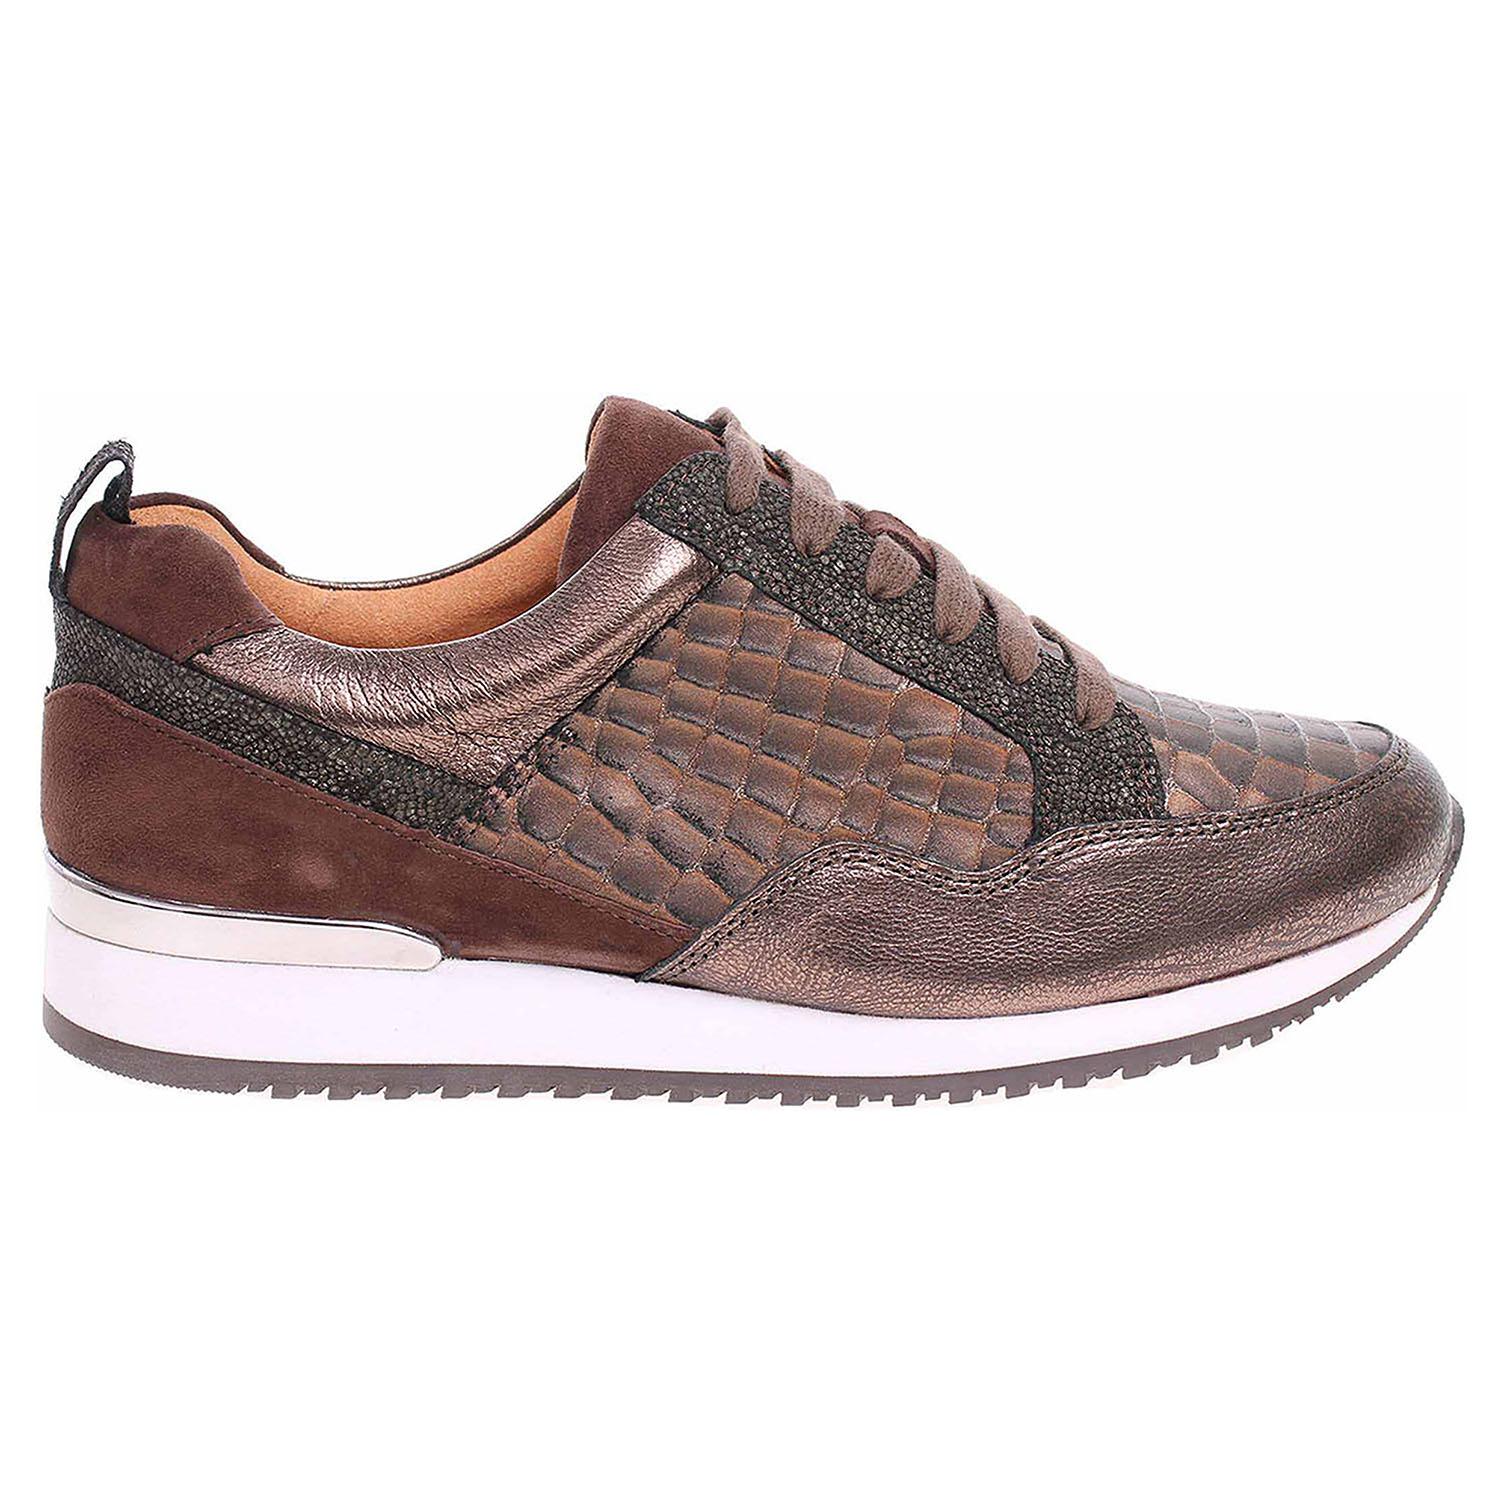 Ecco Caprice dámské polobotky 9-23602-21 brown comb 23200874